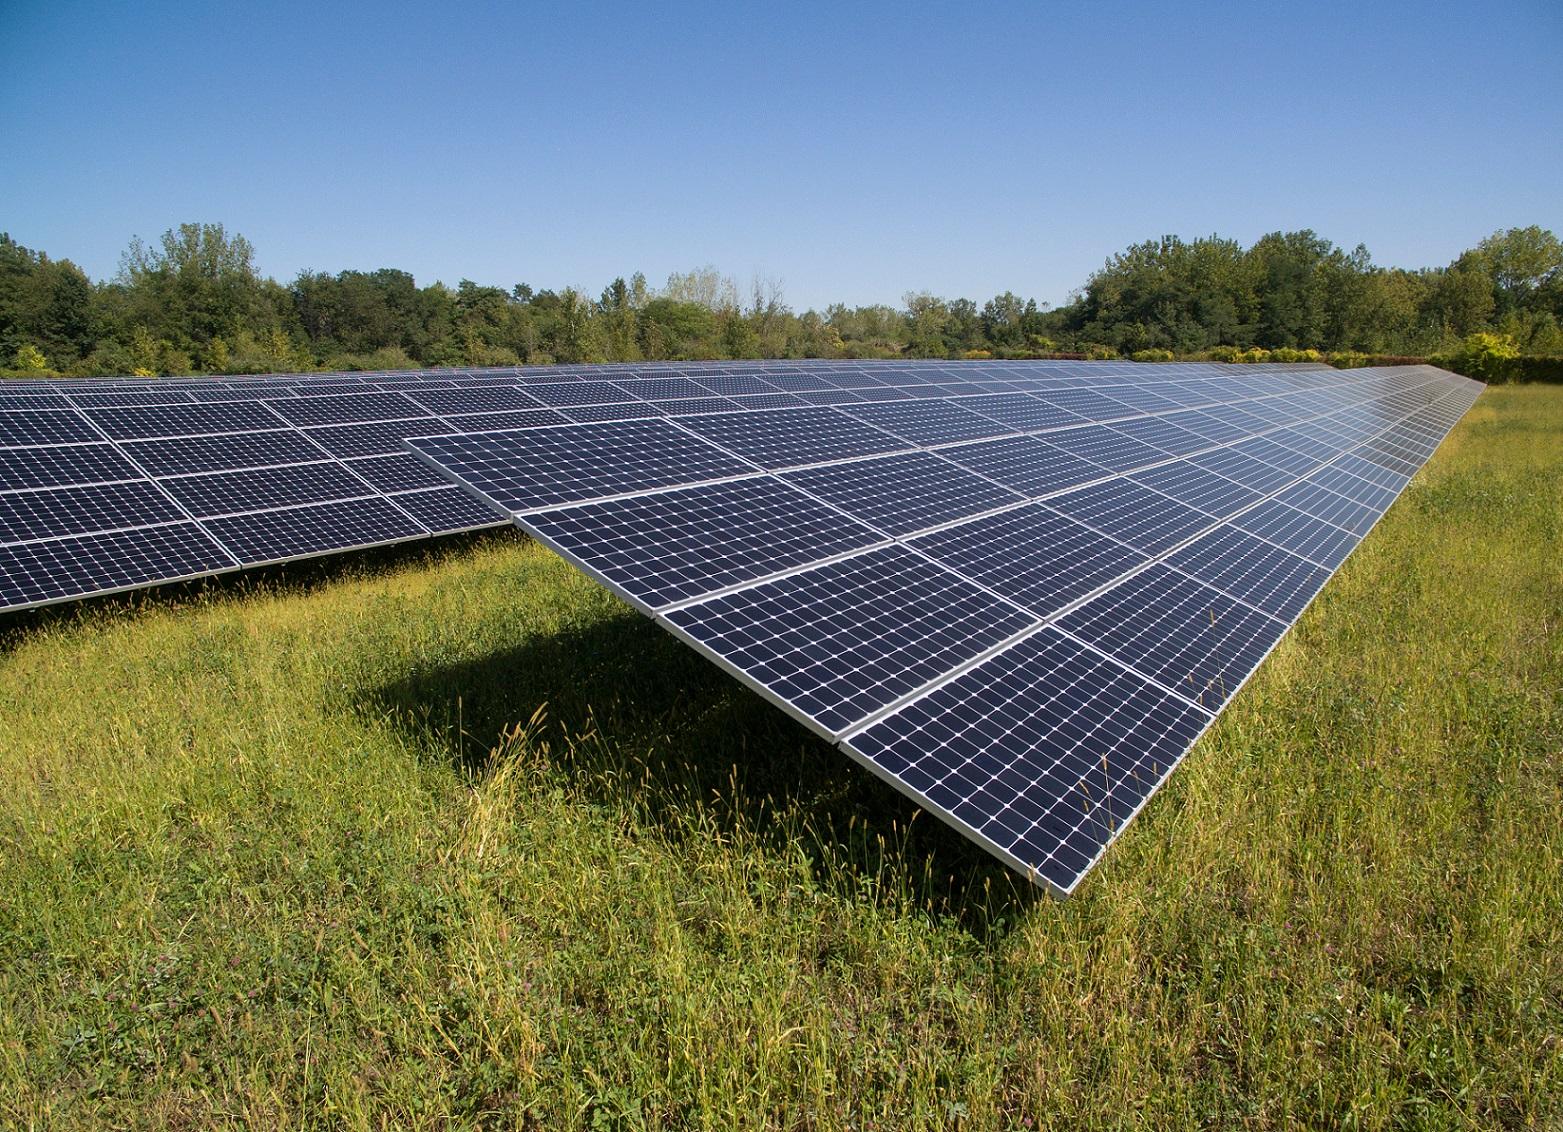 Utility scale solar installation in a grassy field